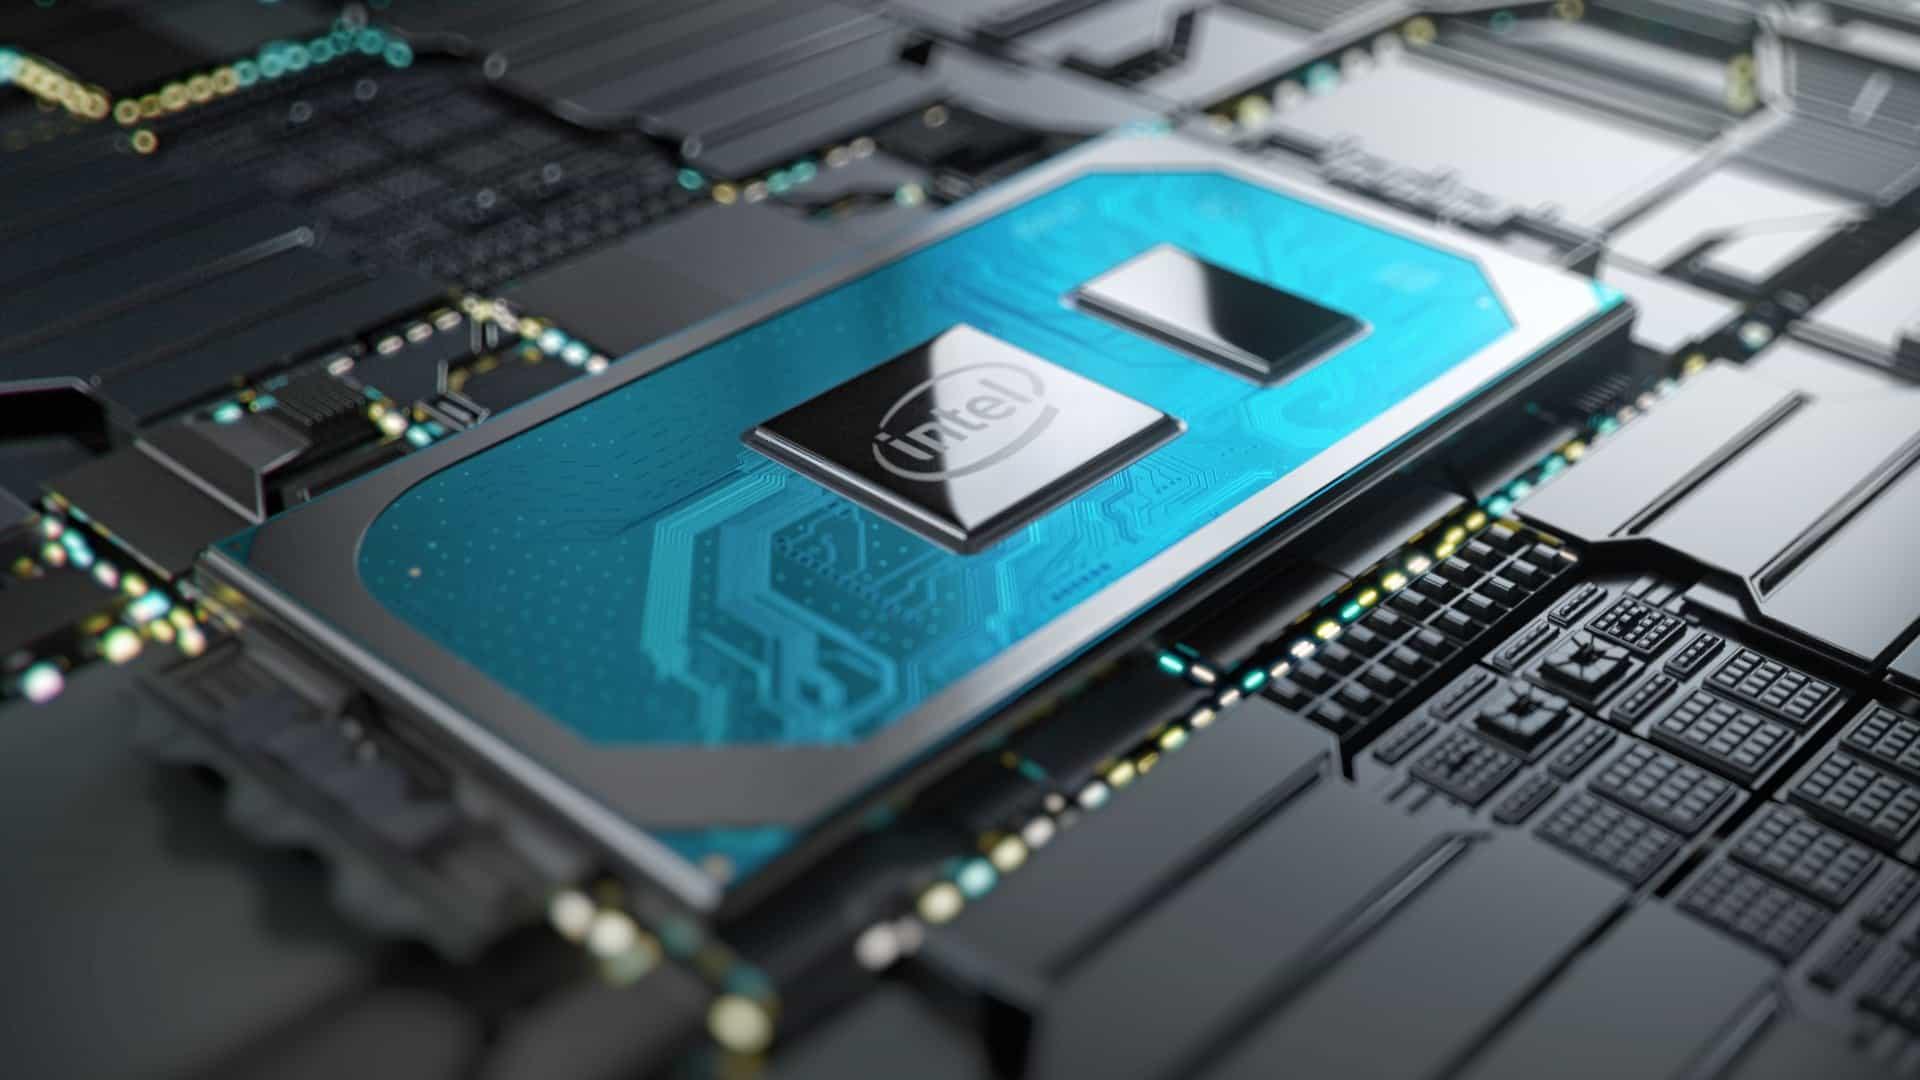 Procesor-Intel-10-Generace-Core-Ice-Lake-1600